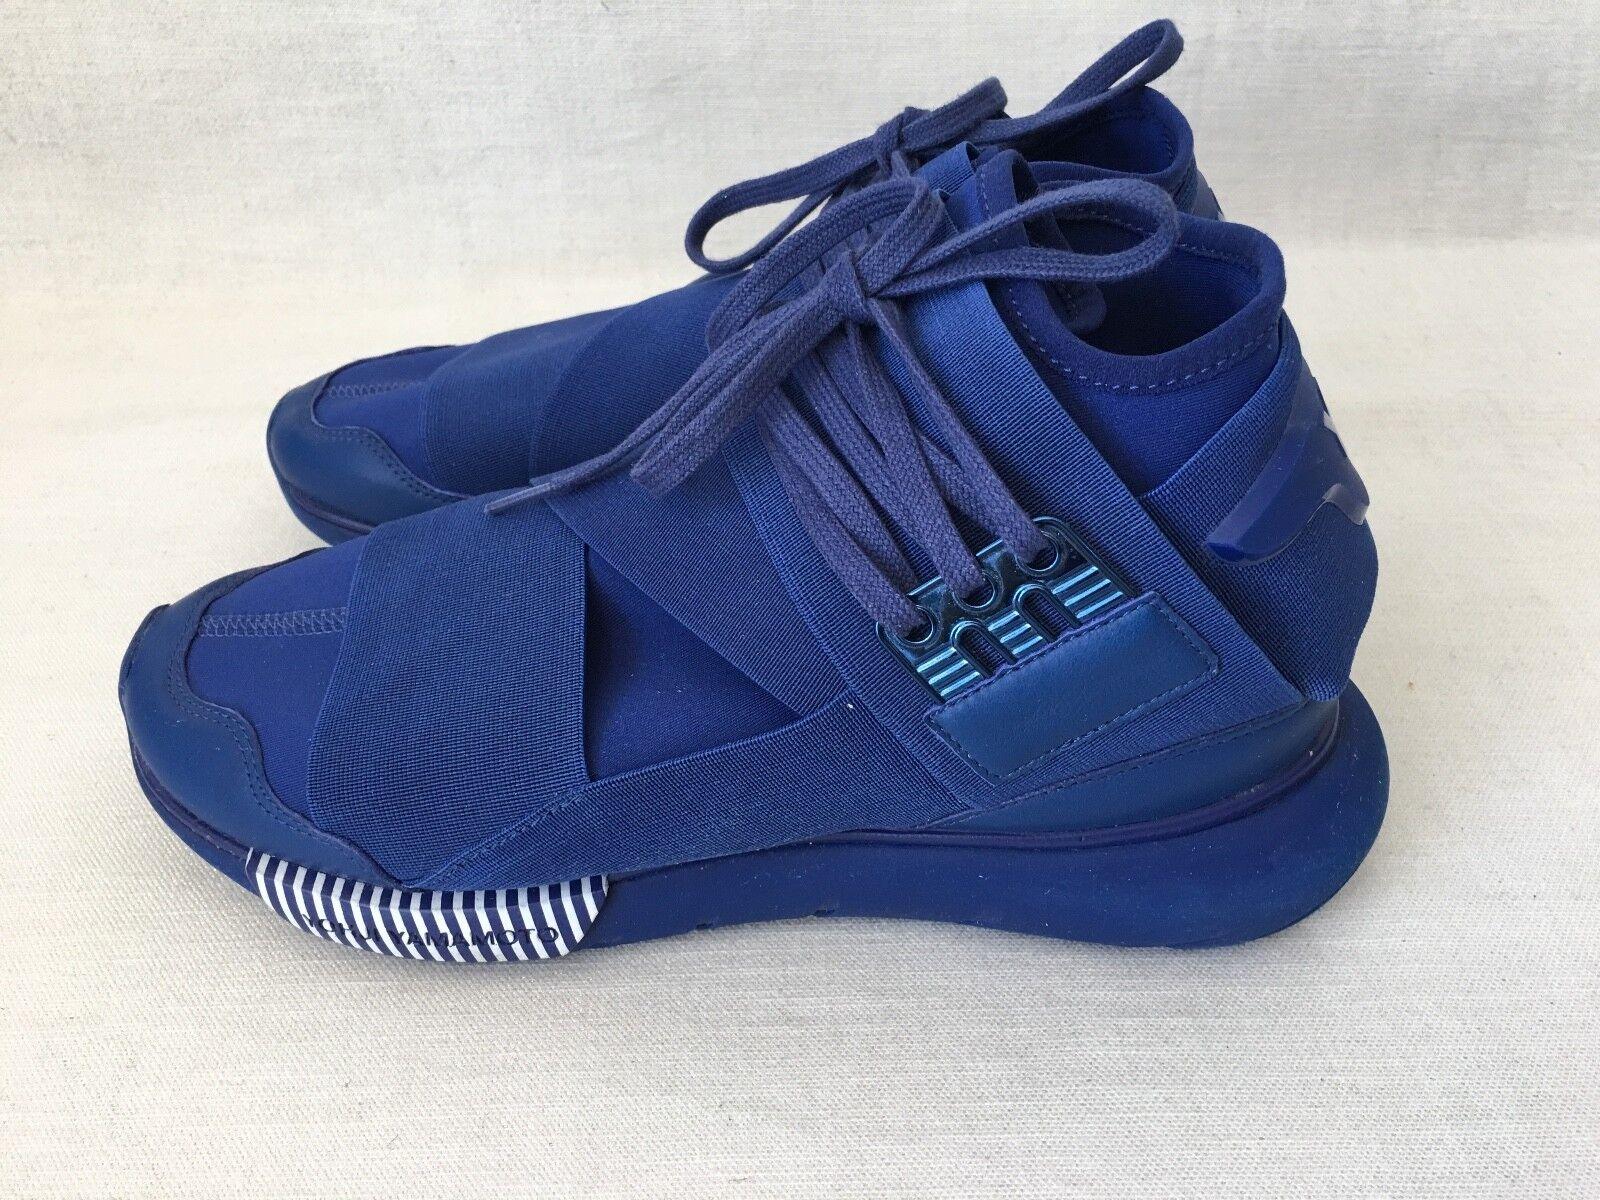 Adidas.Industriales de alta s83175 limitada.Azul.SZ. Yohji Yamamoto Qasa edicion limitada.Azul.SZ. s83175 7,5 6bf610